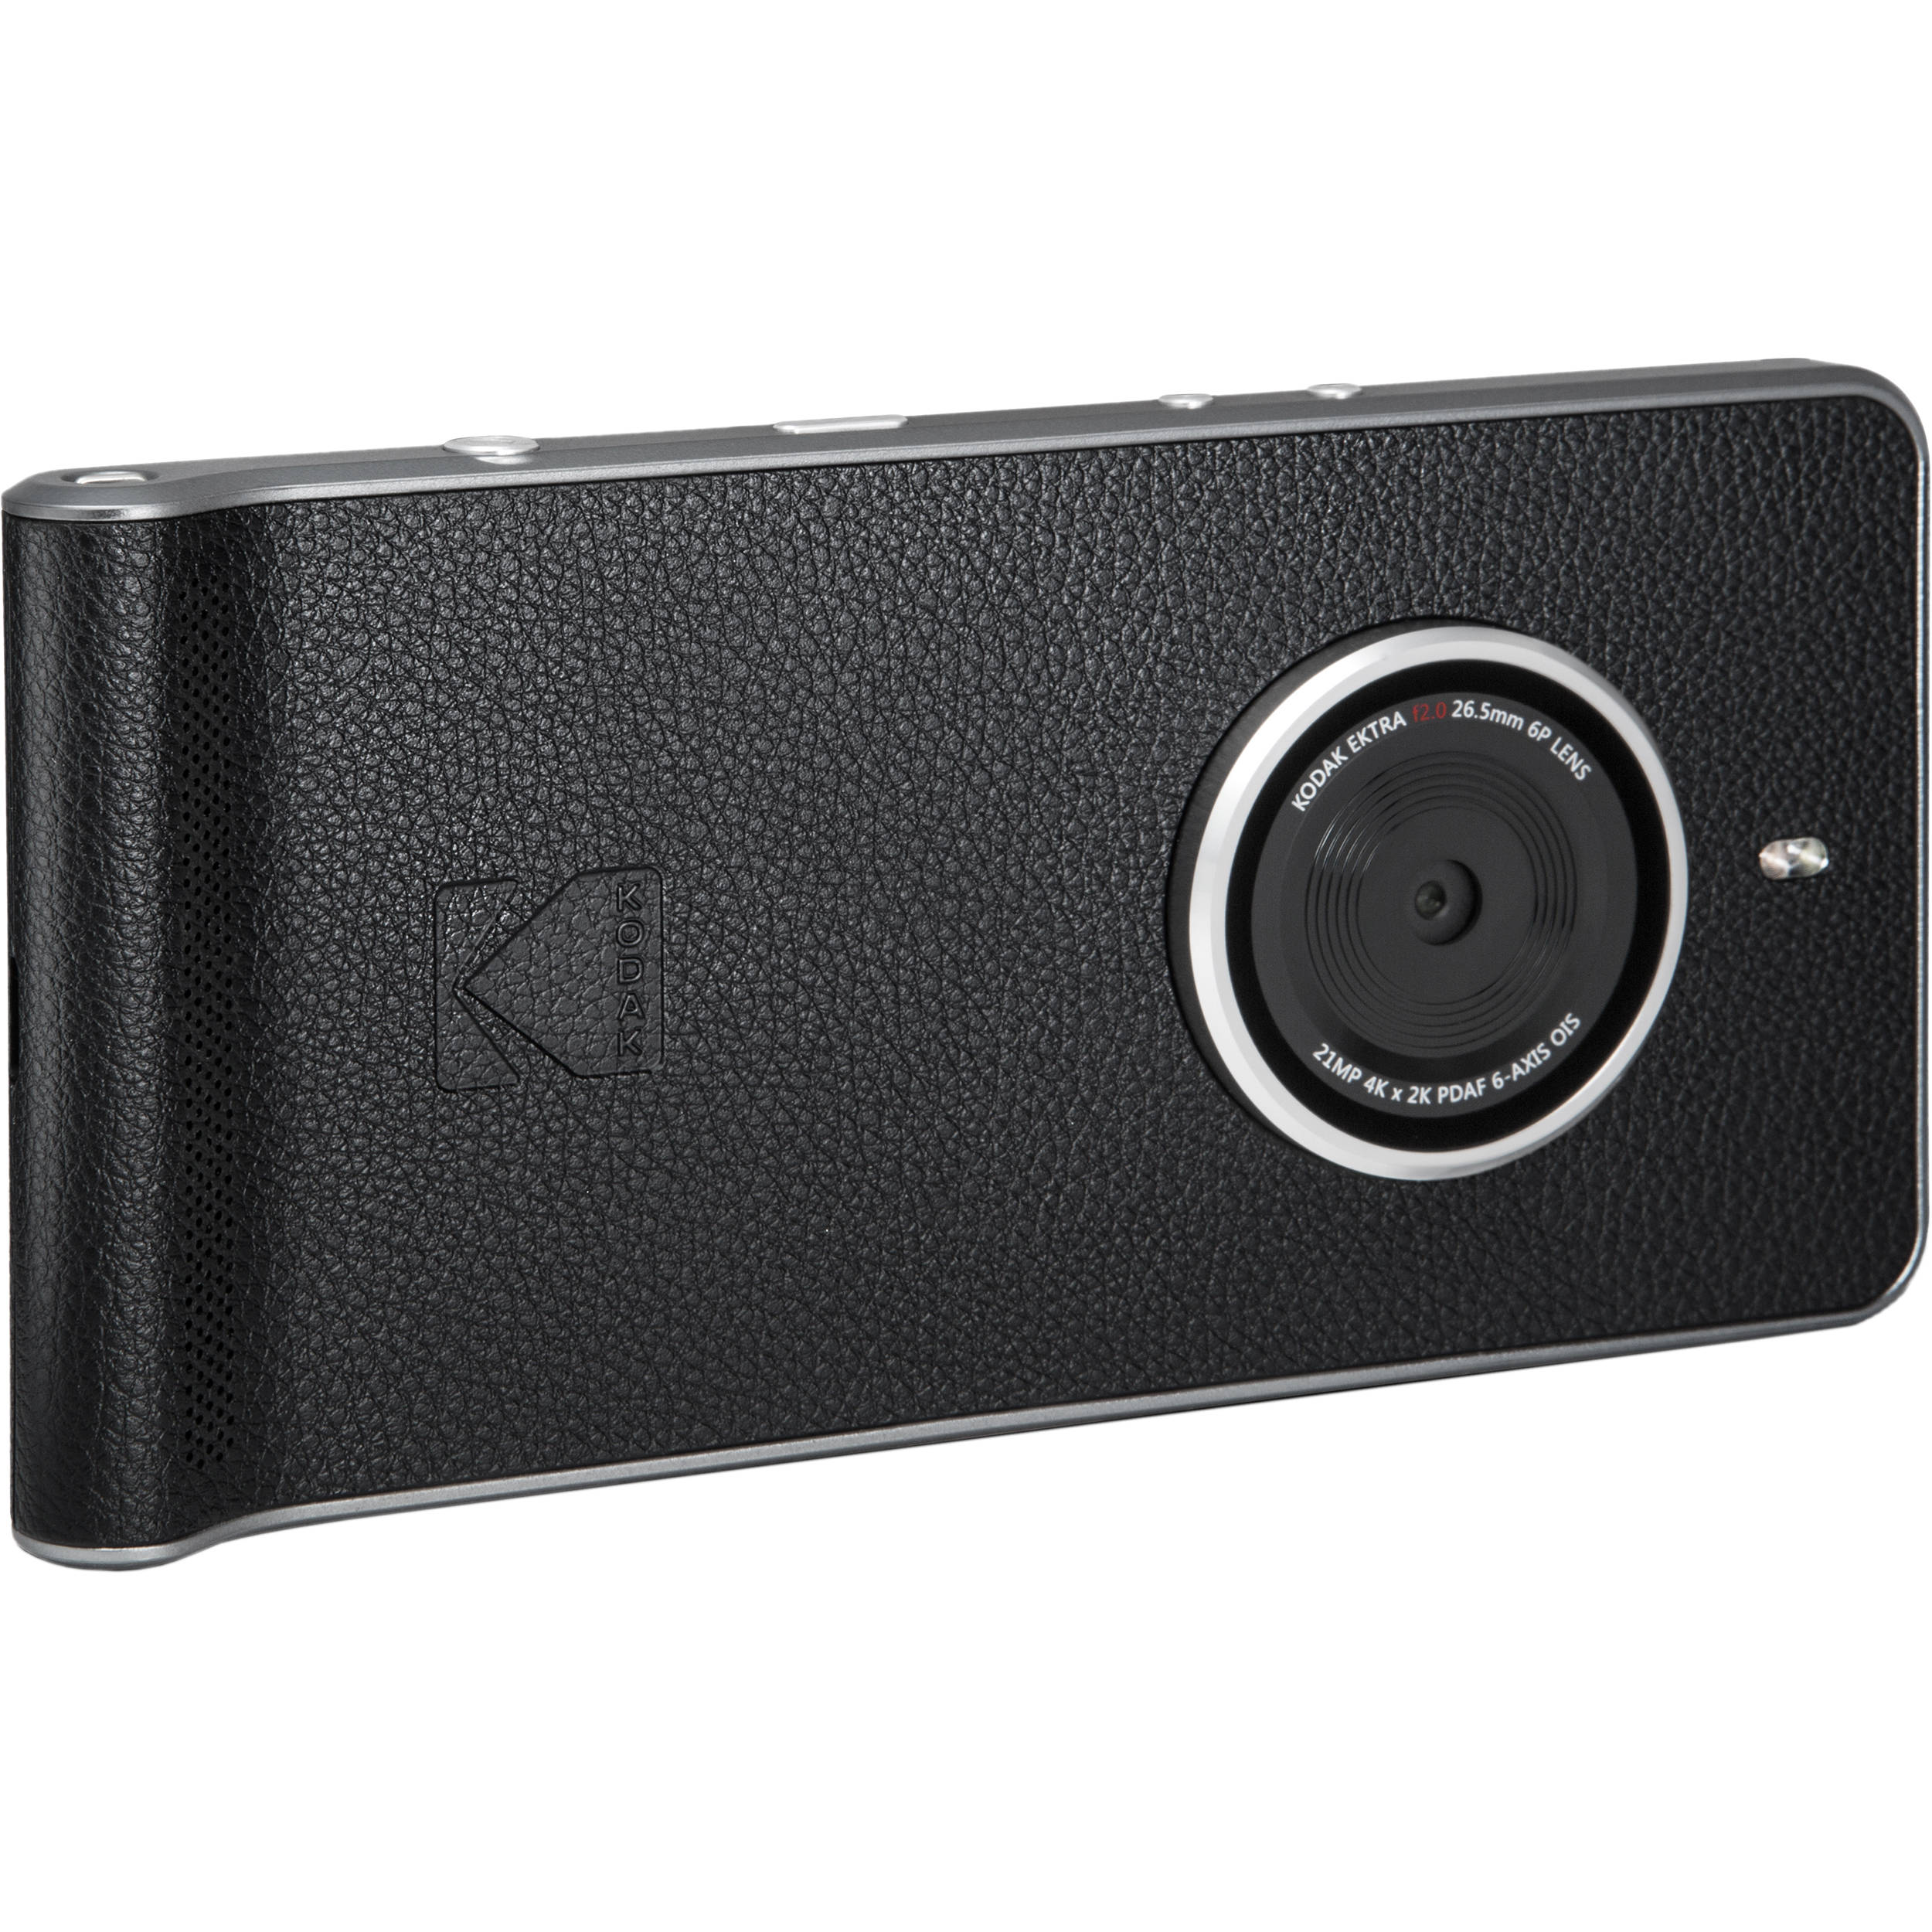 Kodak Ektra 32gb Smartphone Unlocked Black Kektra Sub Usa Un Arduino Relay Control With Johnnyfive Devacroncom